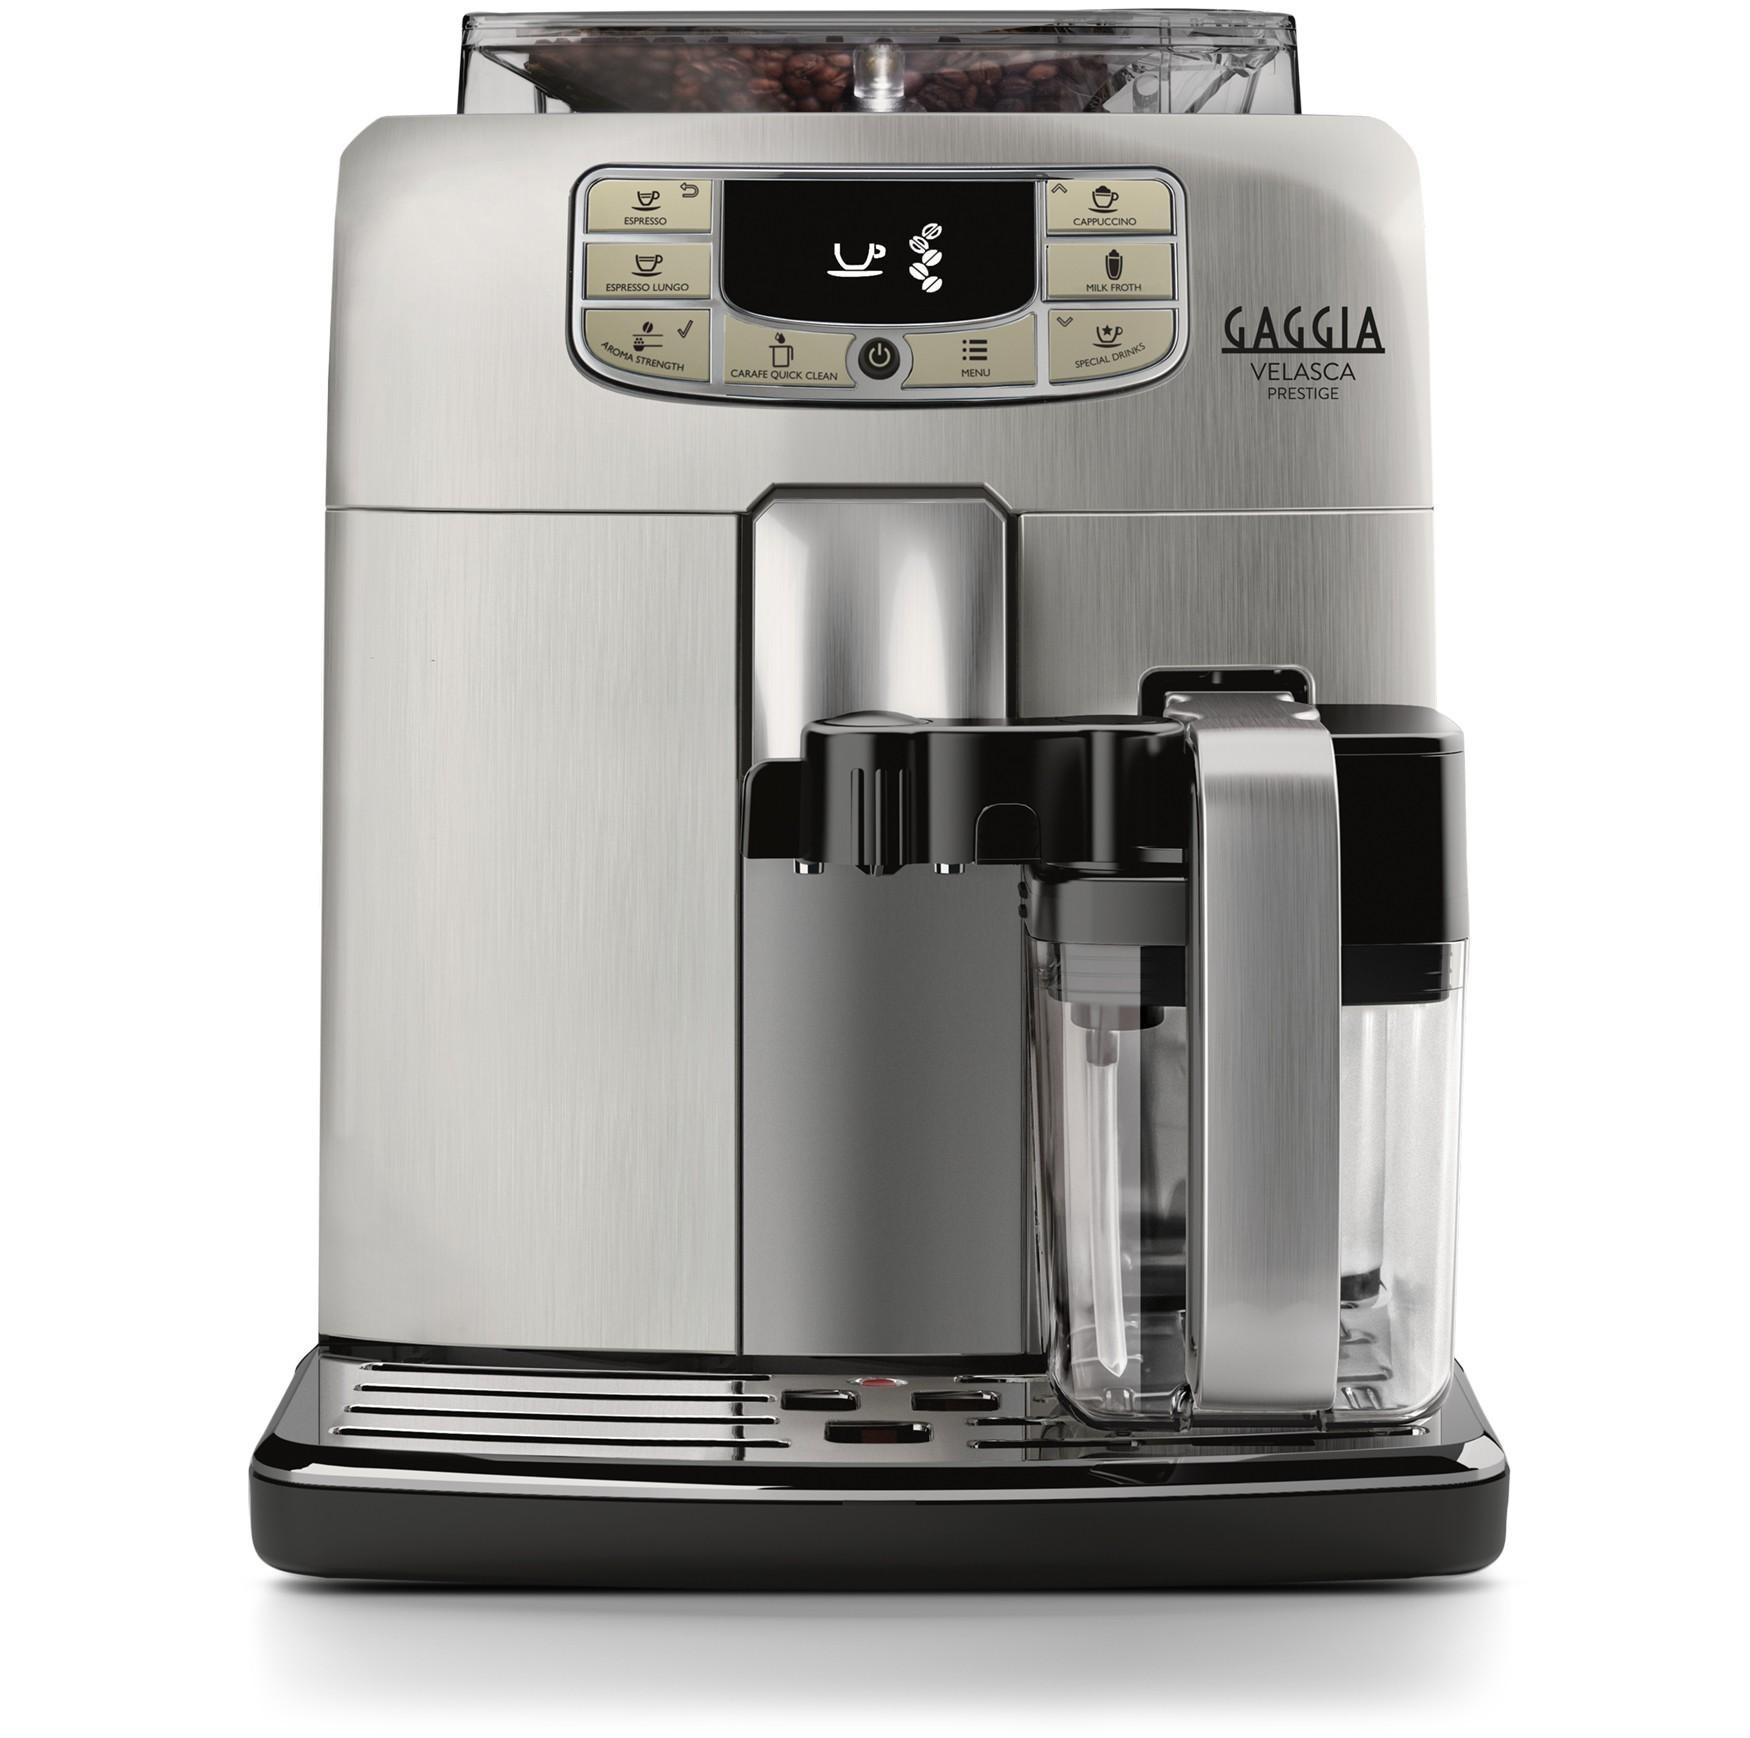 Кофеварка / кофемашина Gaggia Velasca Prestige